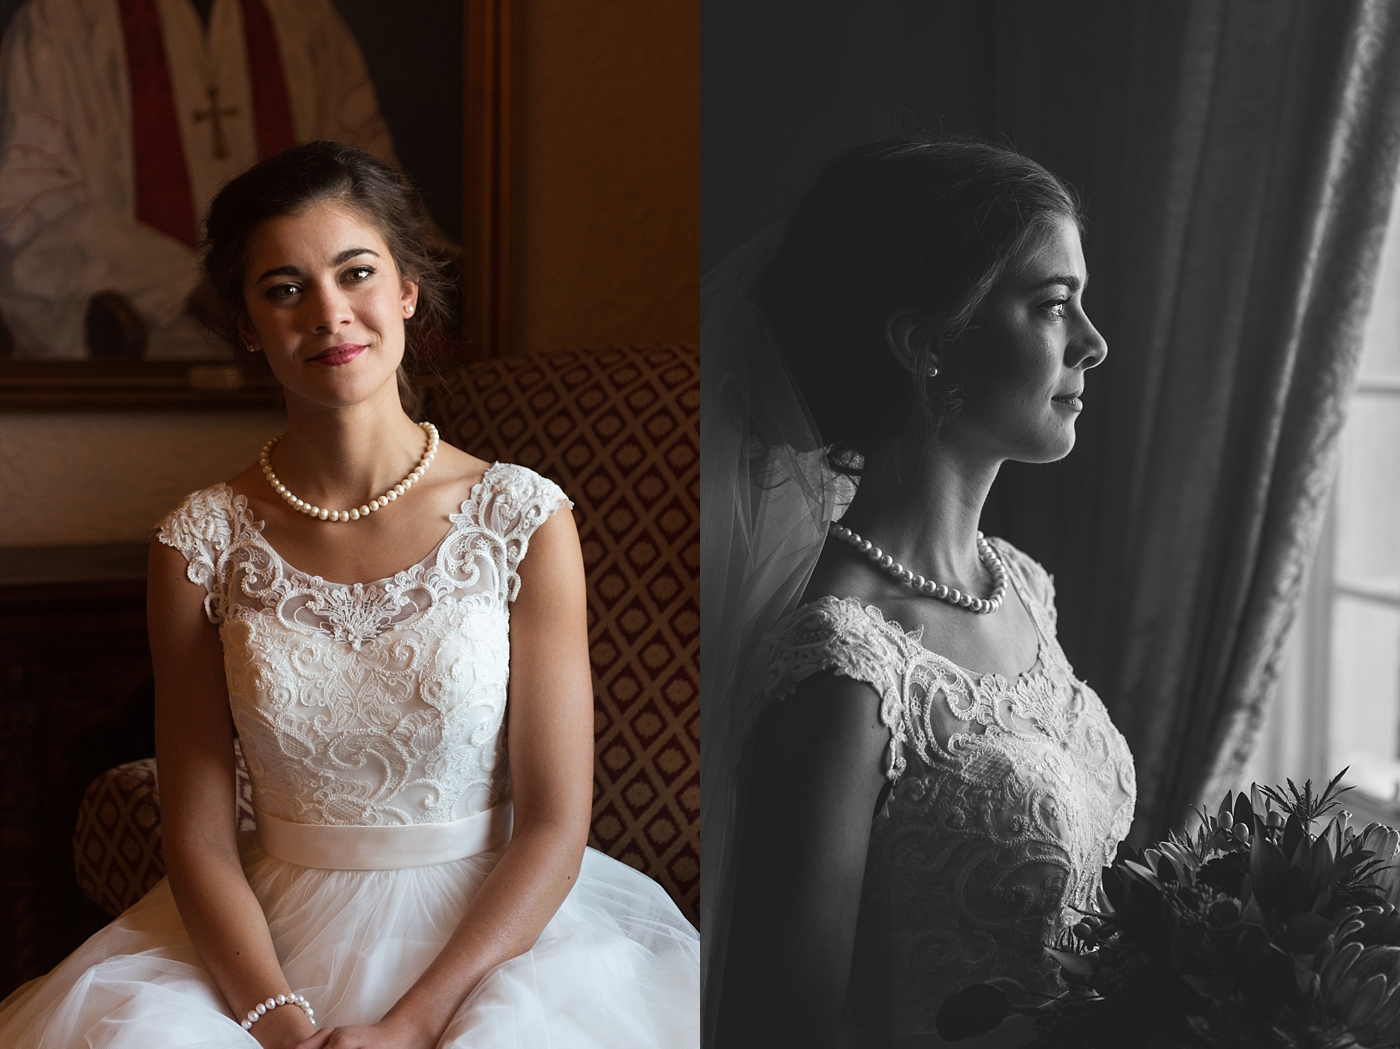 indianapolis-top-rated-wedding-photographers_0407.jpg